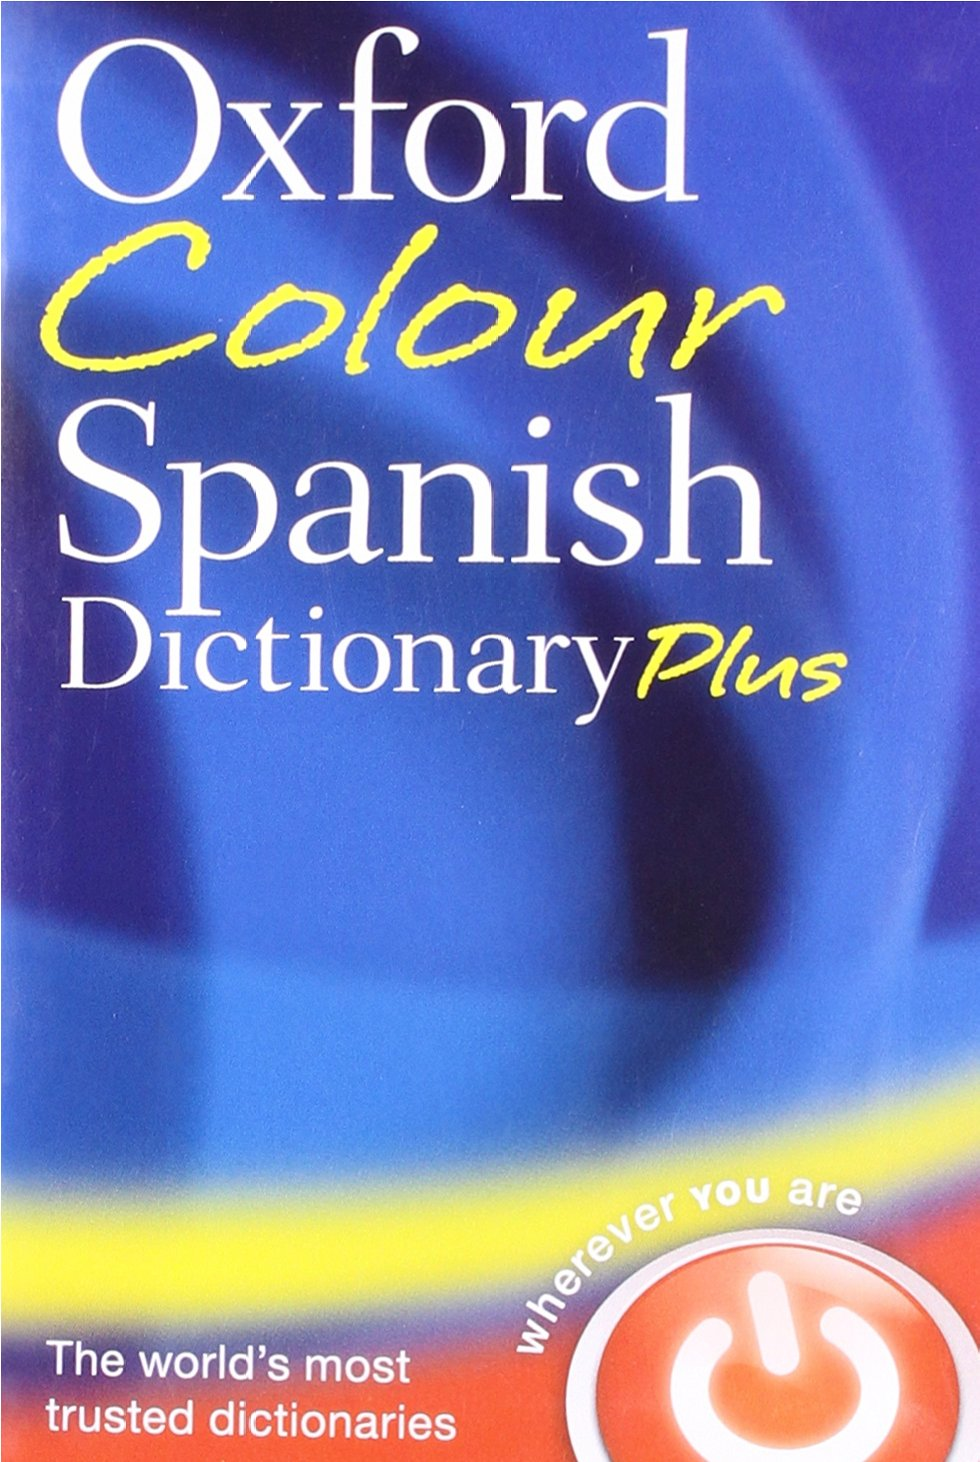 Oxford colour spanish dictionary plus amazon co uk oxford dictionaries 9780199599561 books